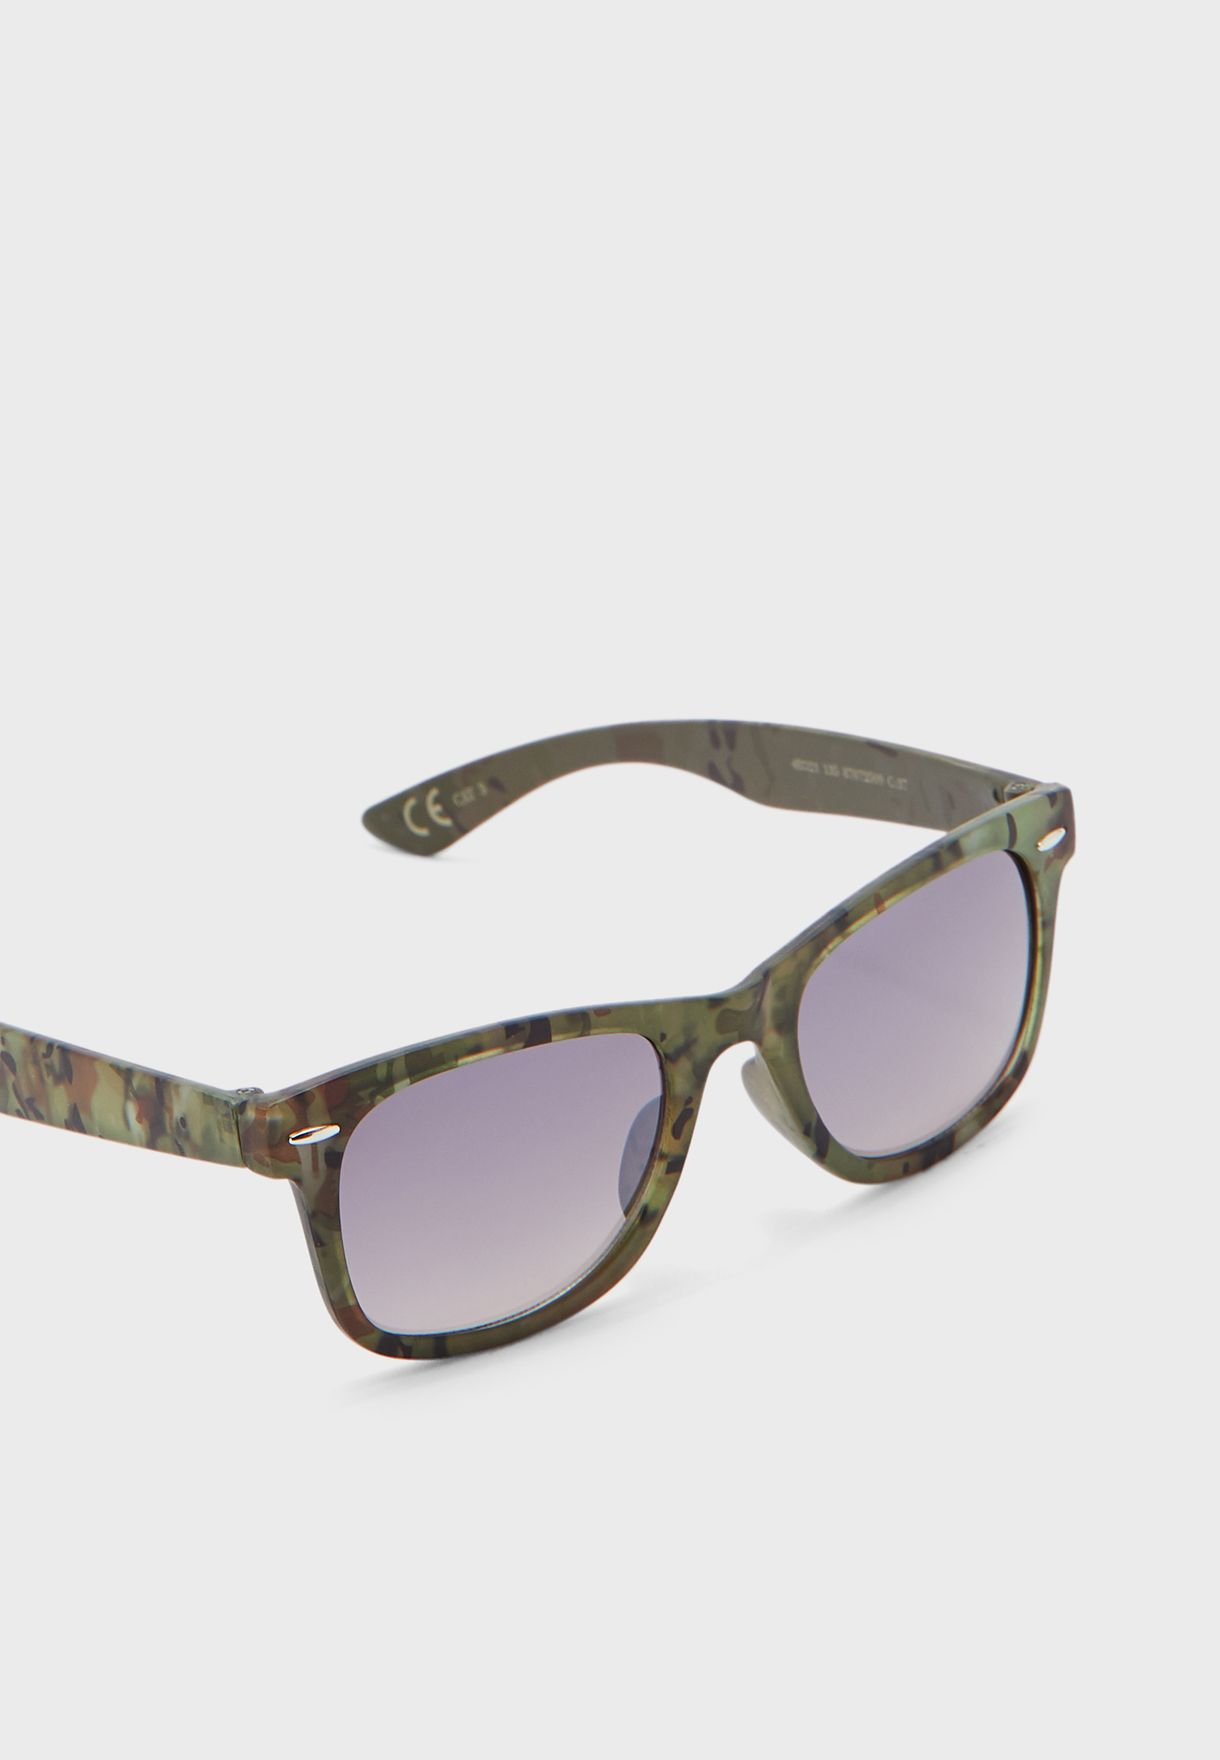 Kids Acetate Frame Sunglasses